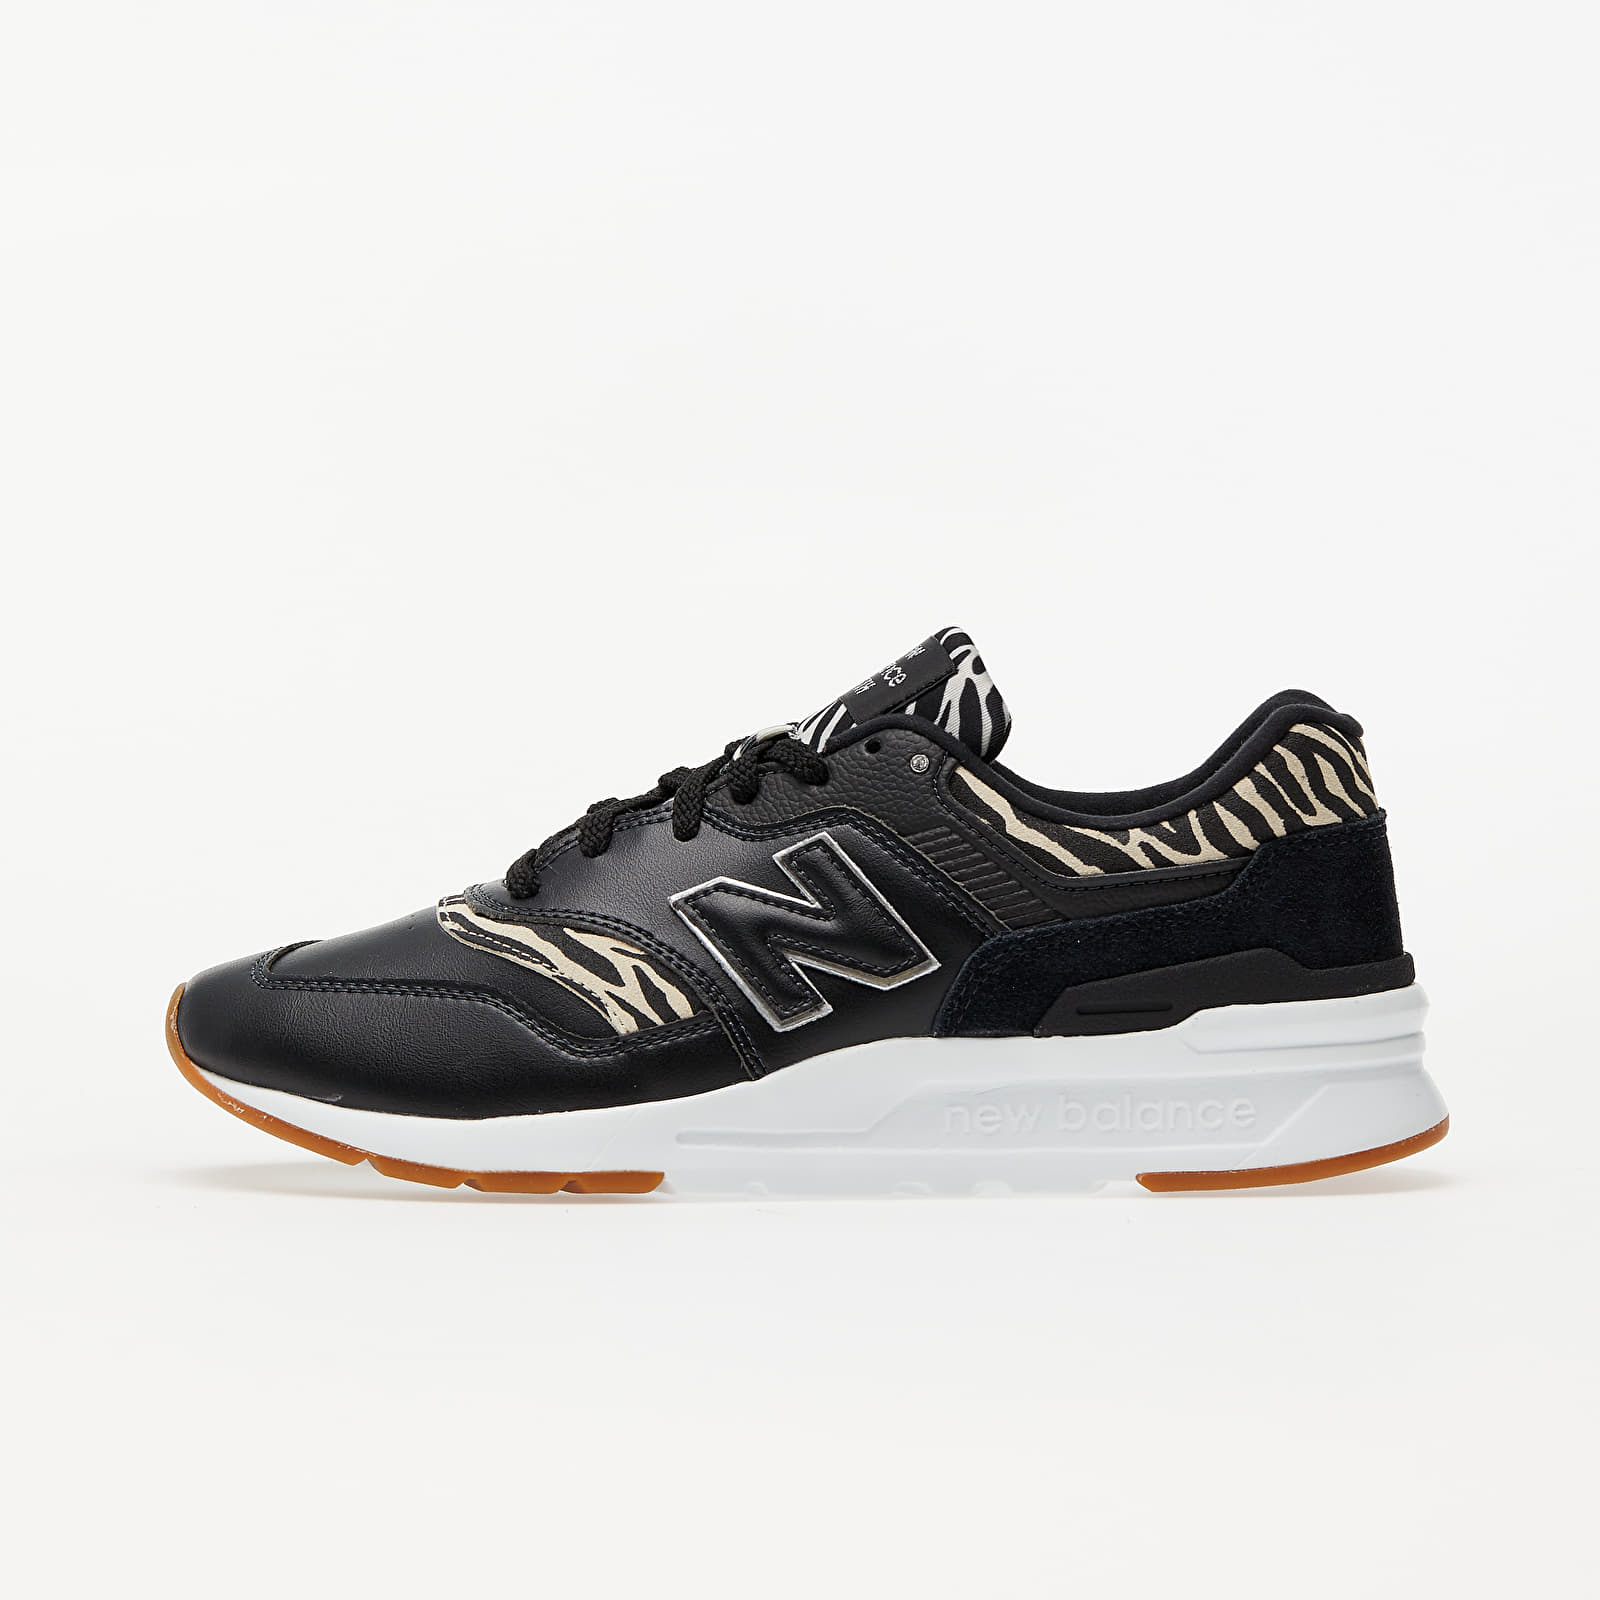 New Balance 997 Black CW997HCI